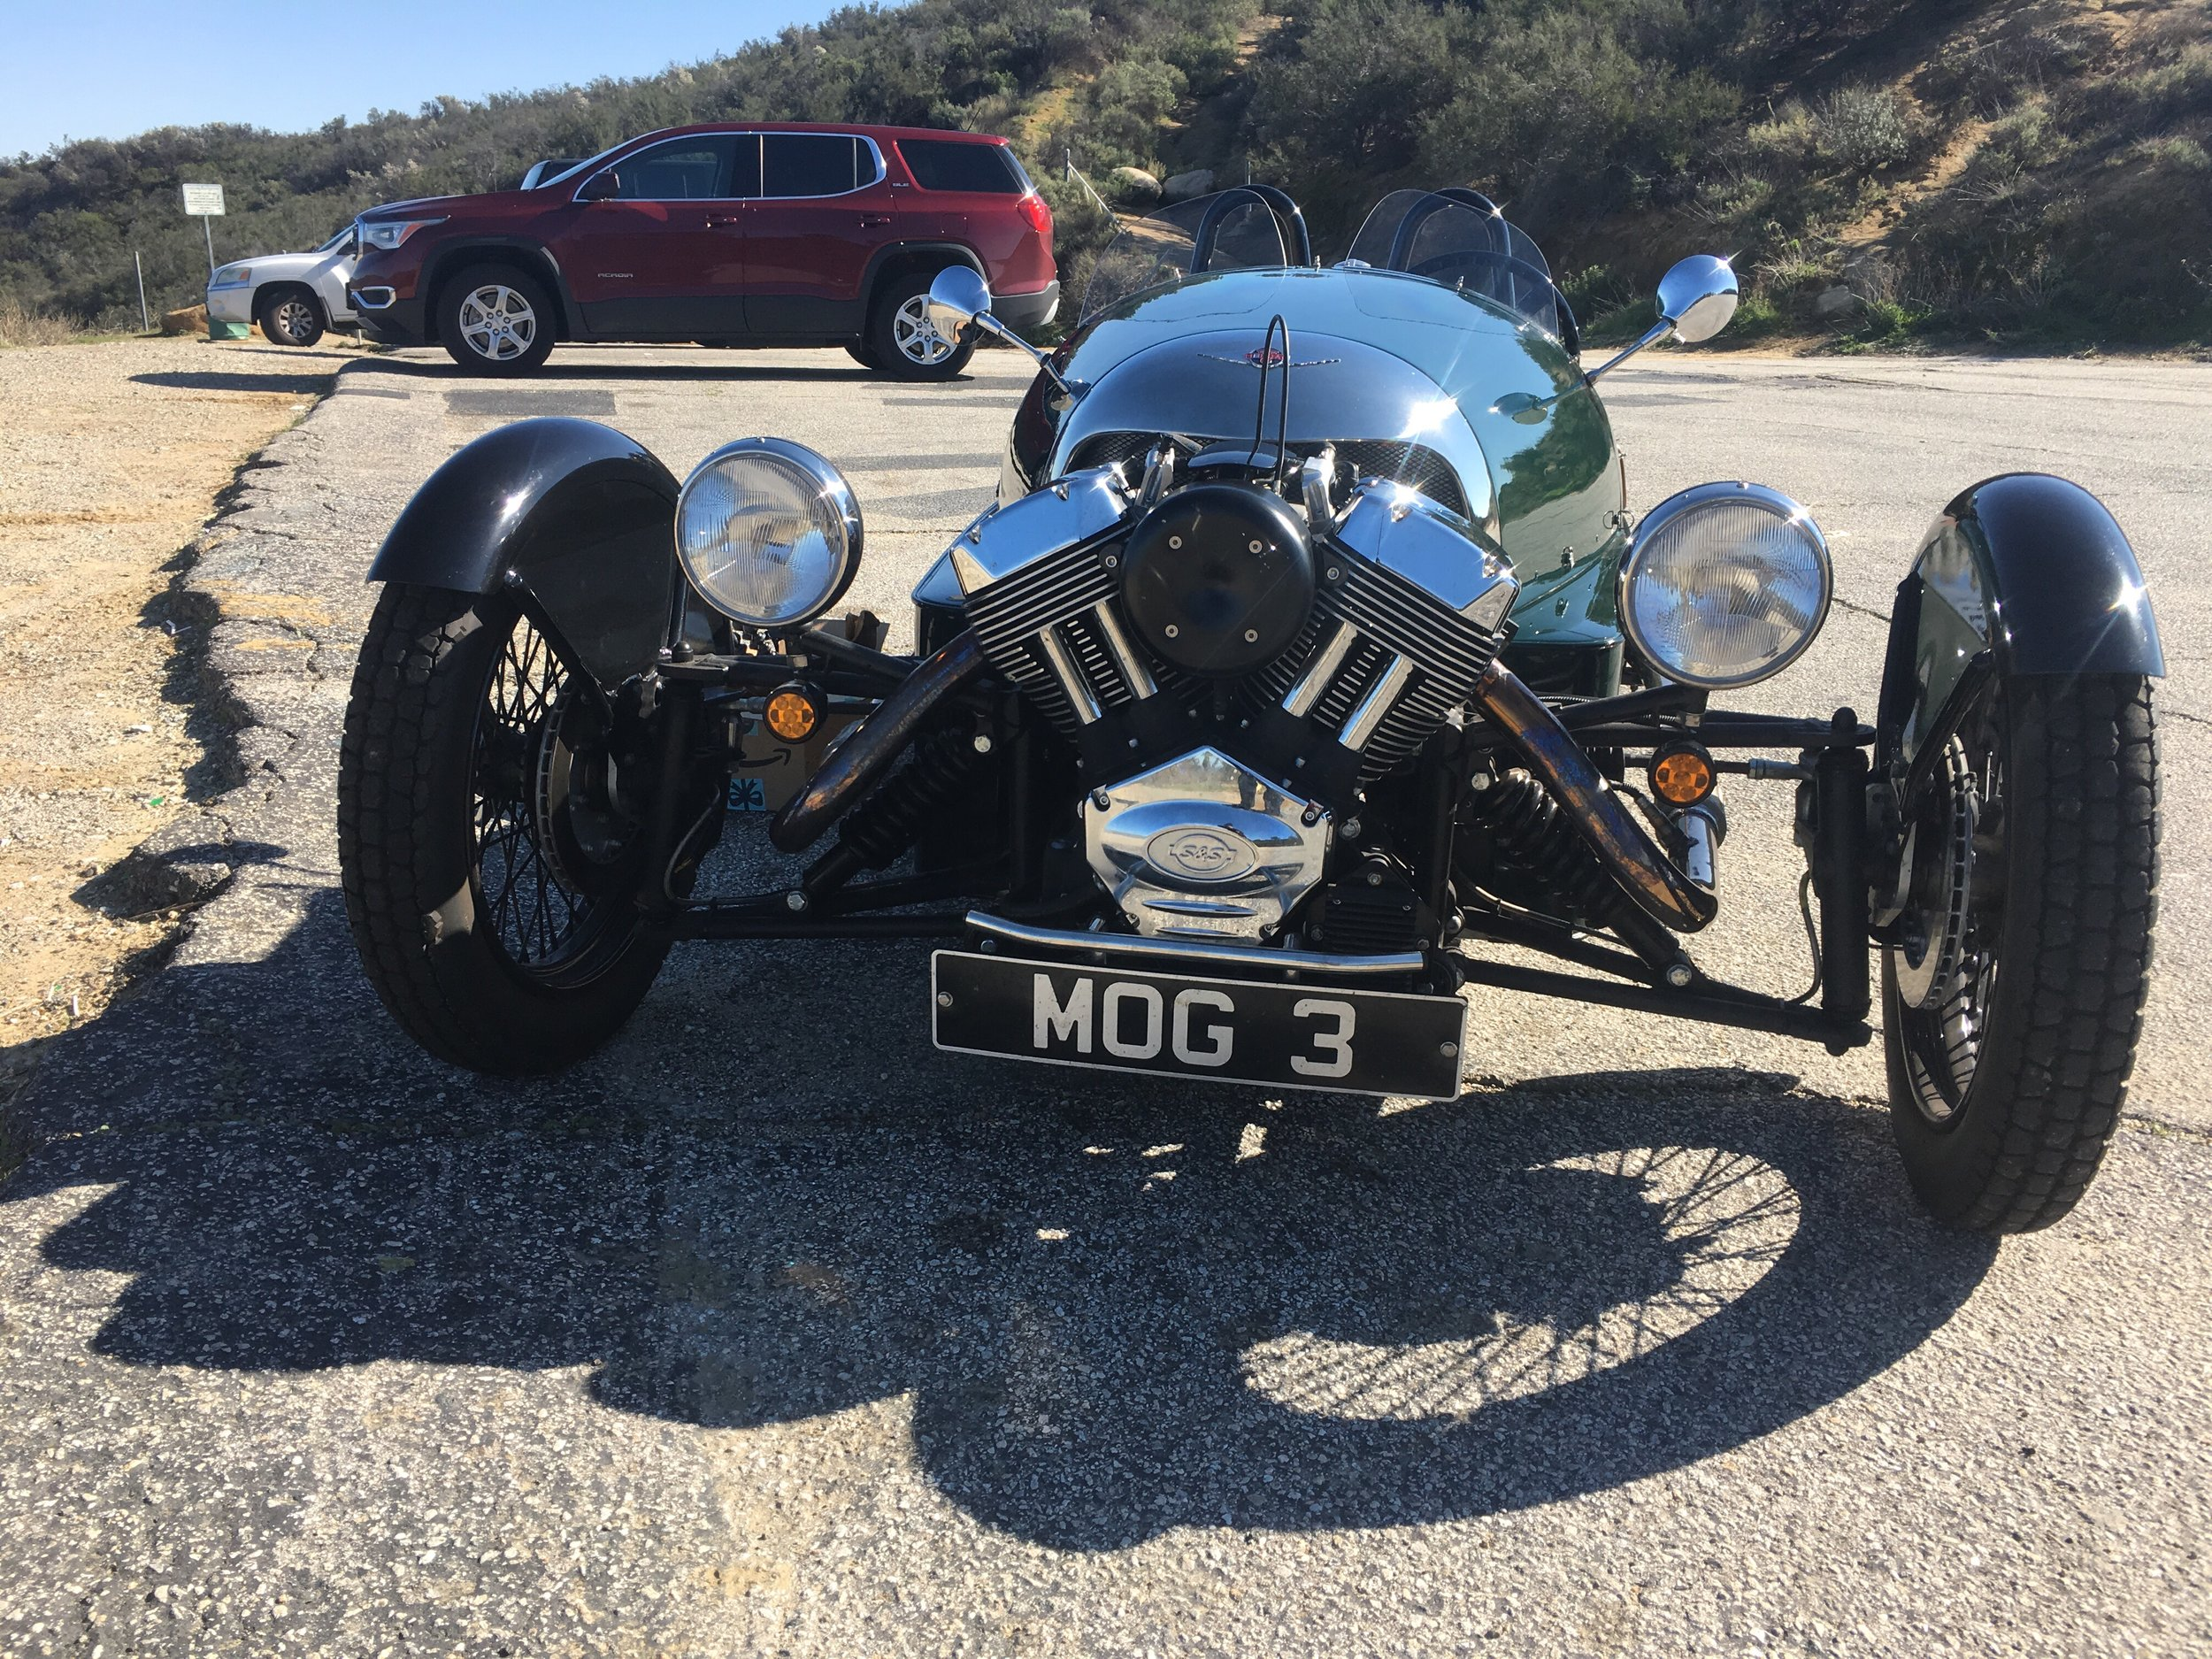 Morgan S&S Engine